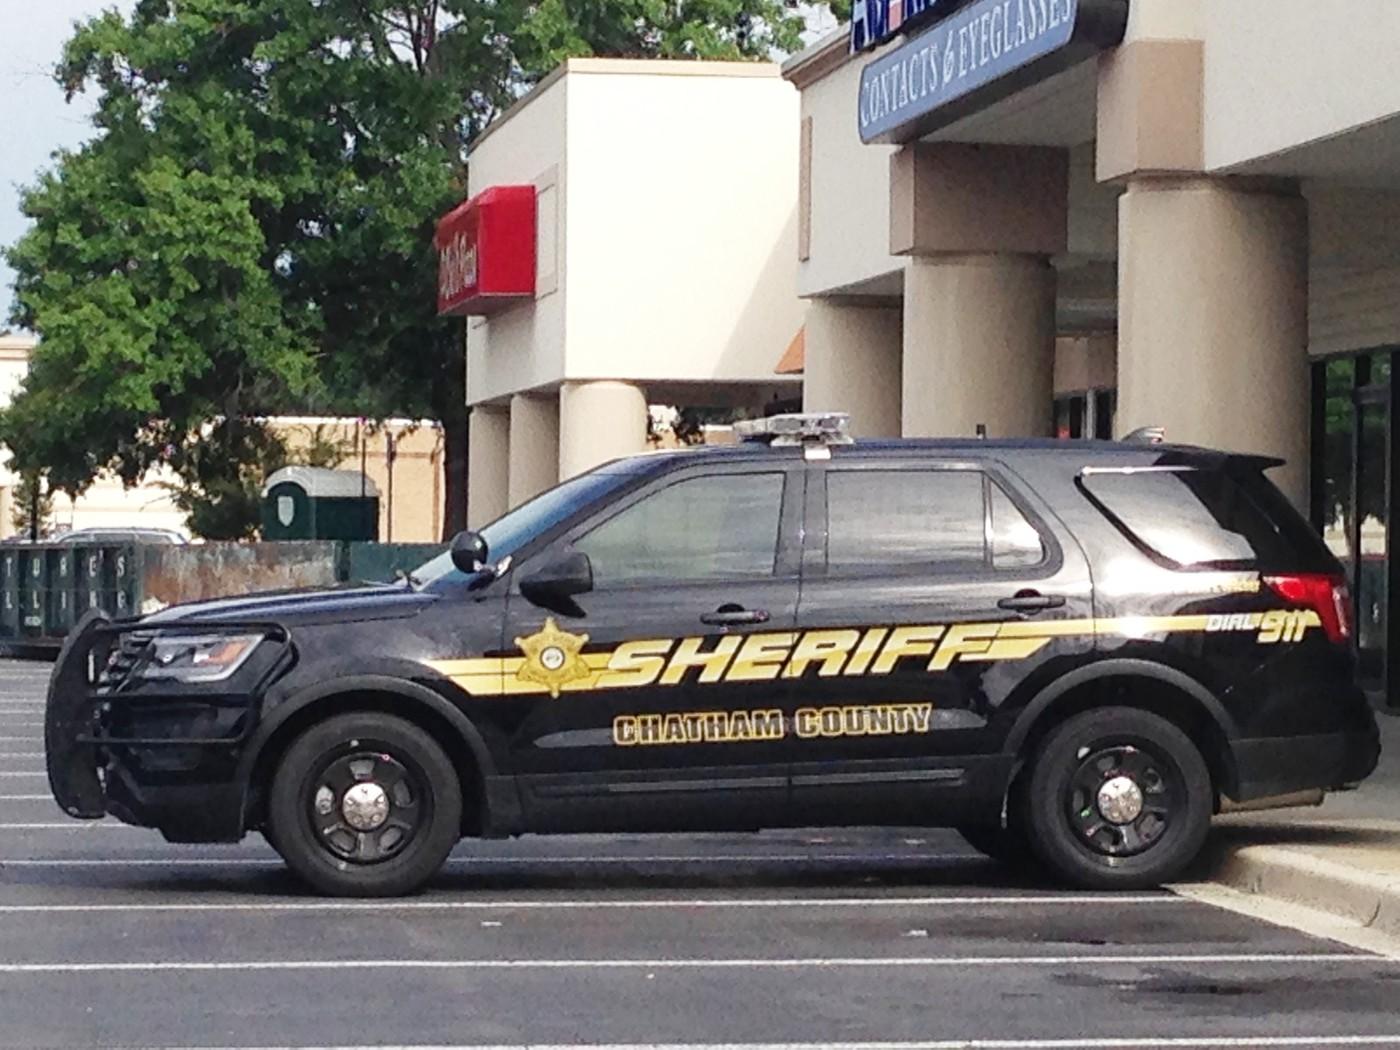 GA - Chatham County Sheriff